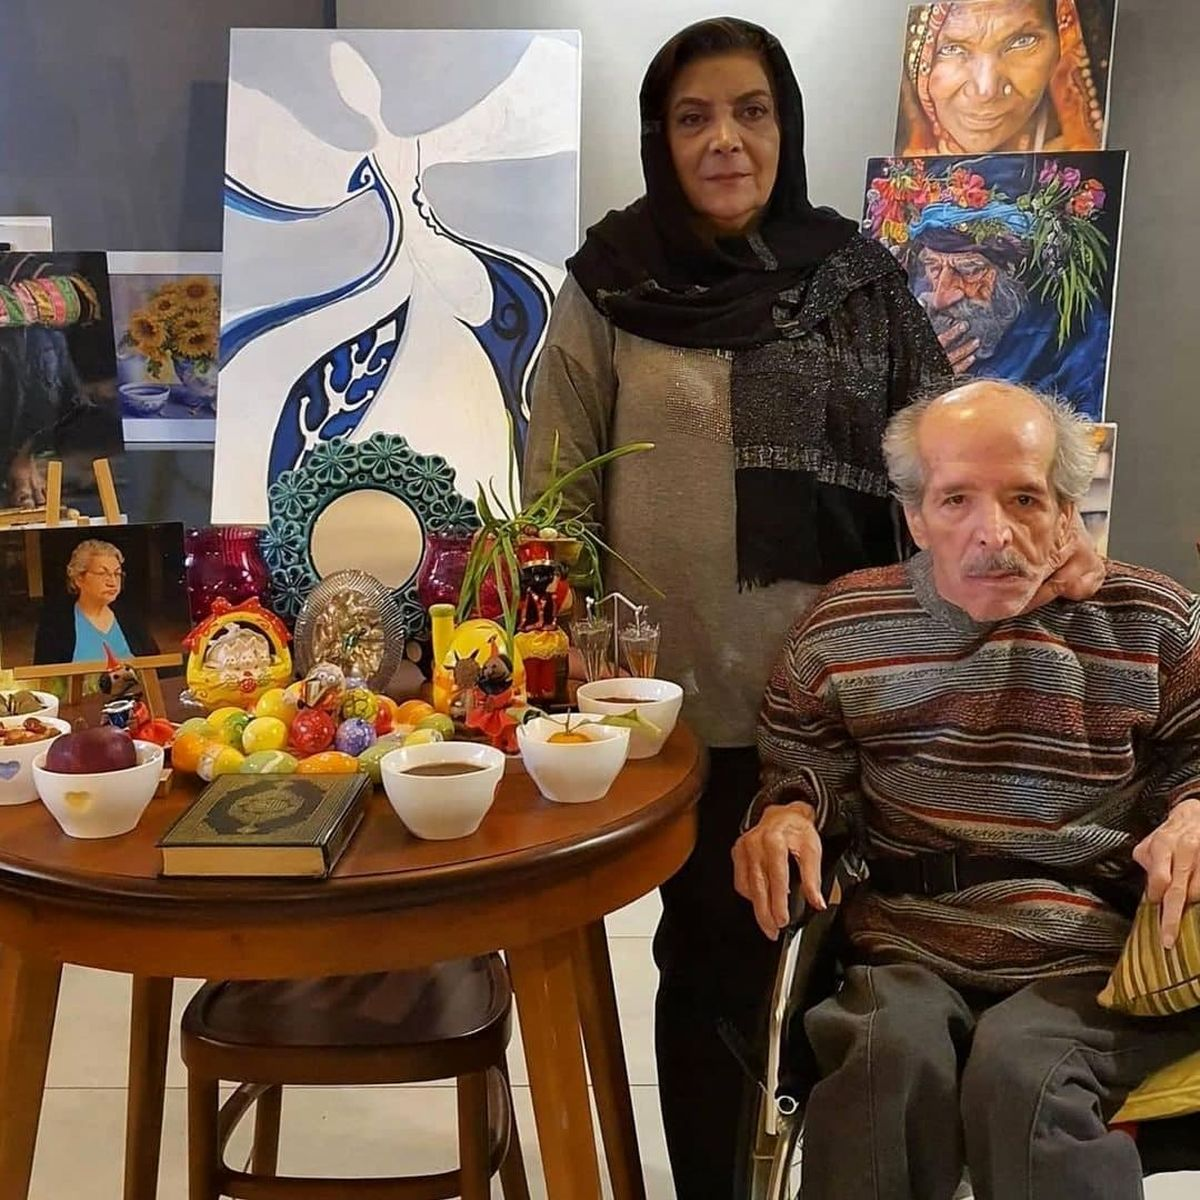 عکس نوروزی محسن قاضی مرادی و همسرش